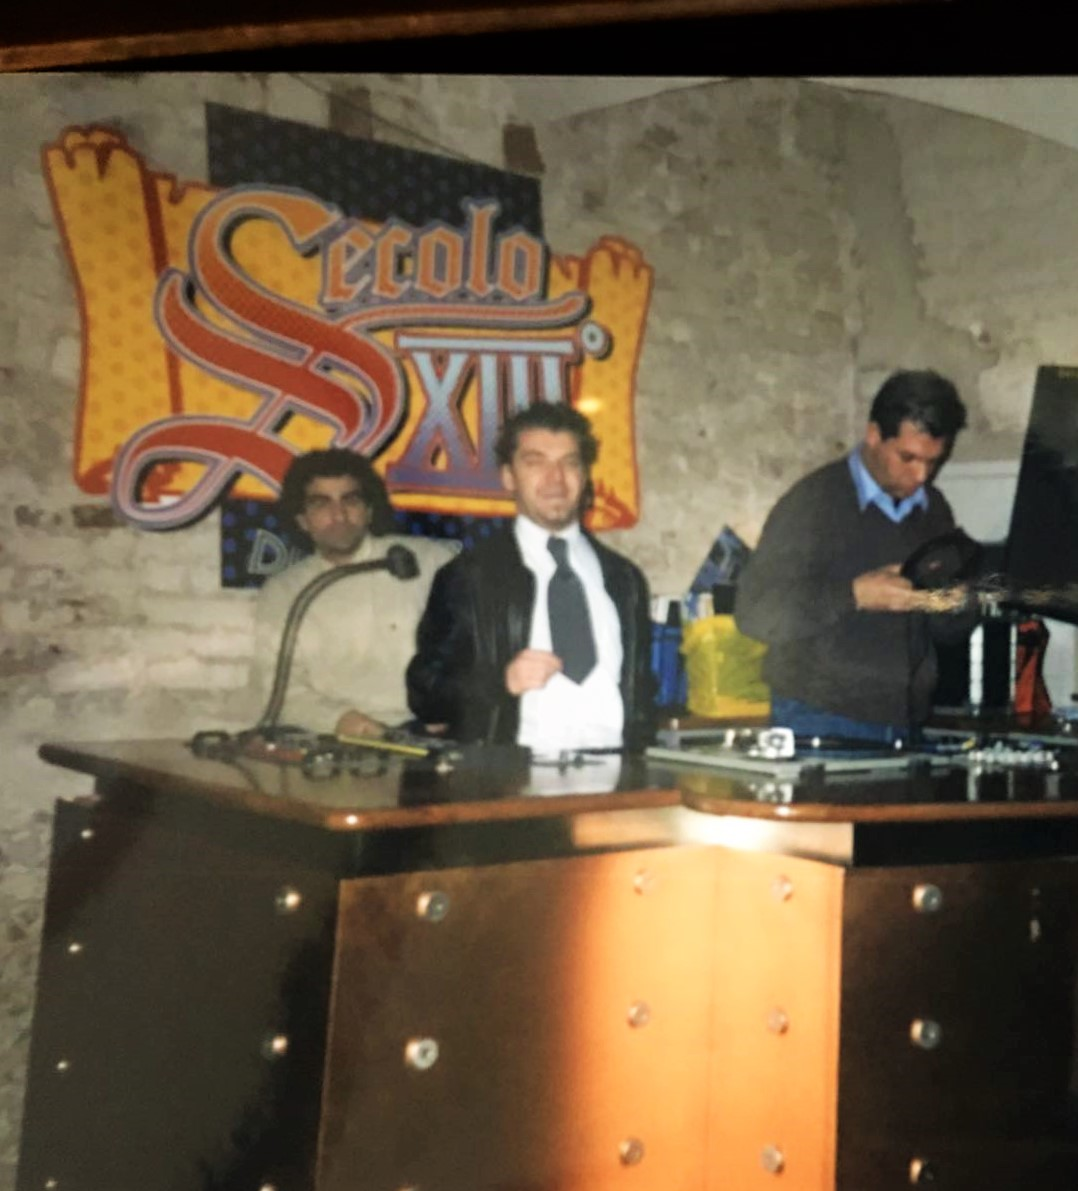 Secolo XIII° Discoteca Piemonte